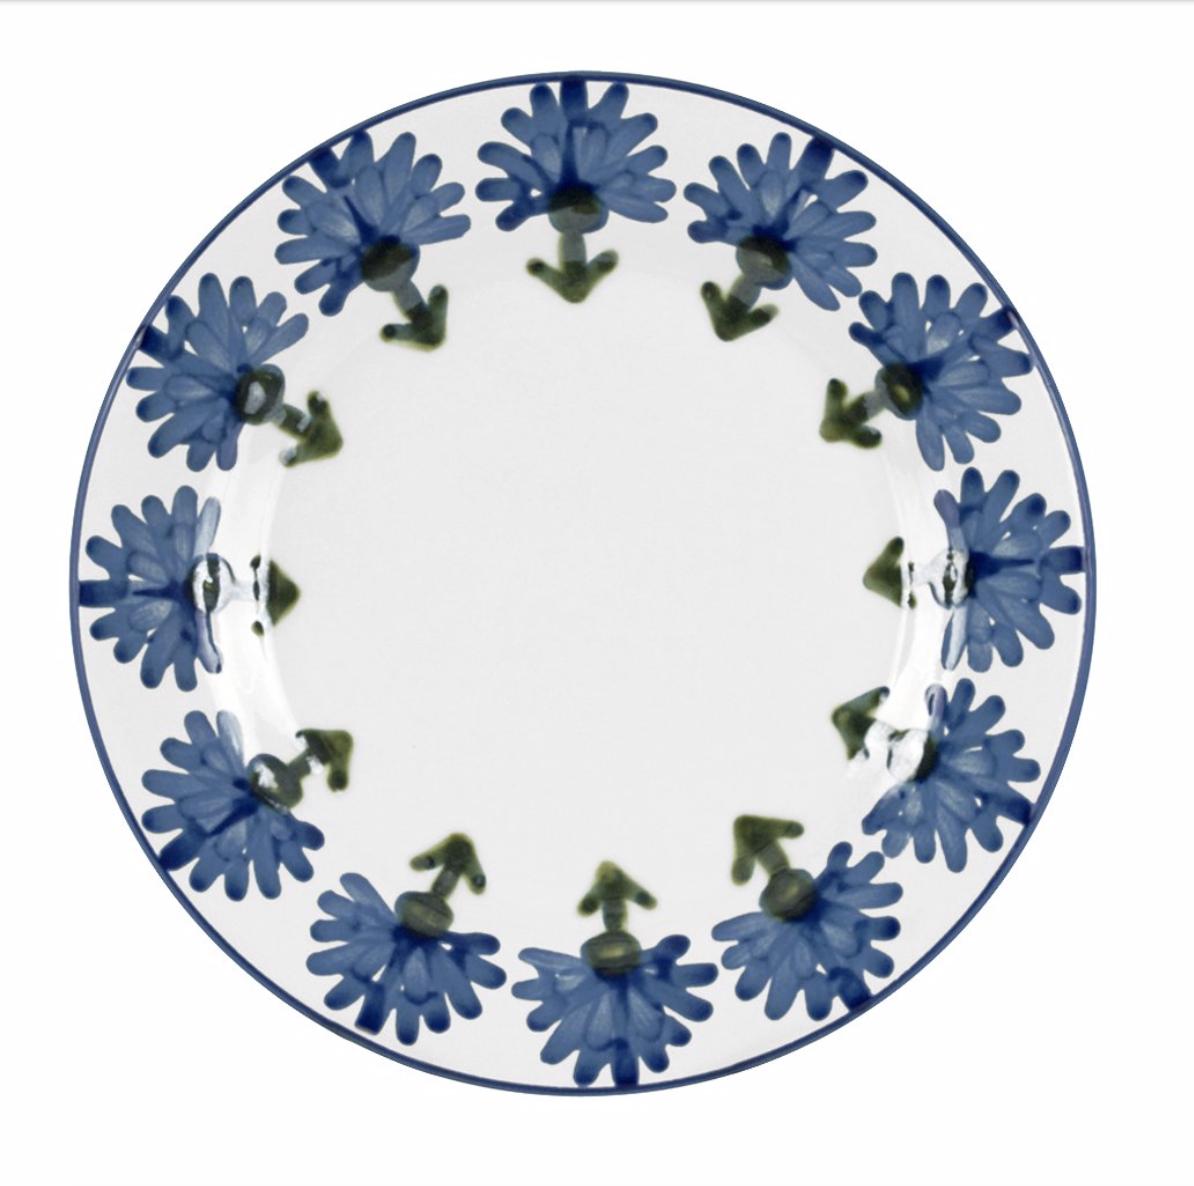 Dinner Plates  Fete Home